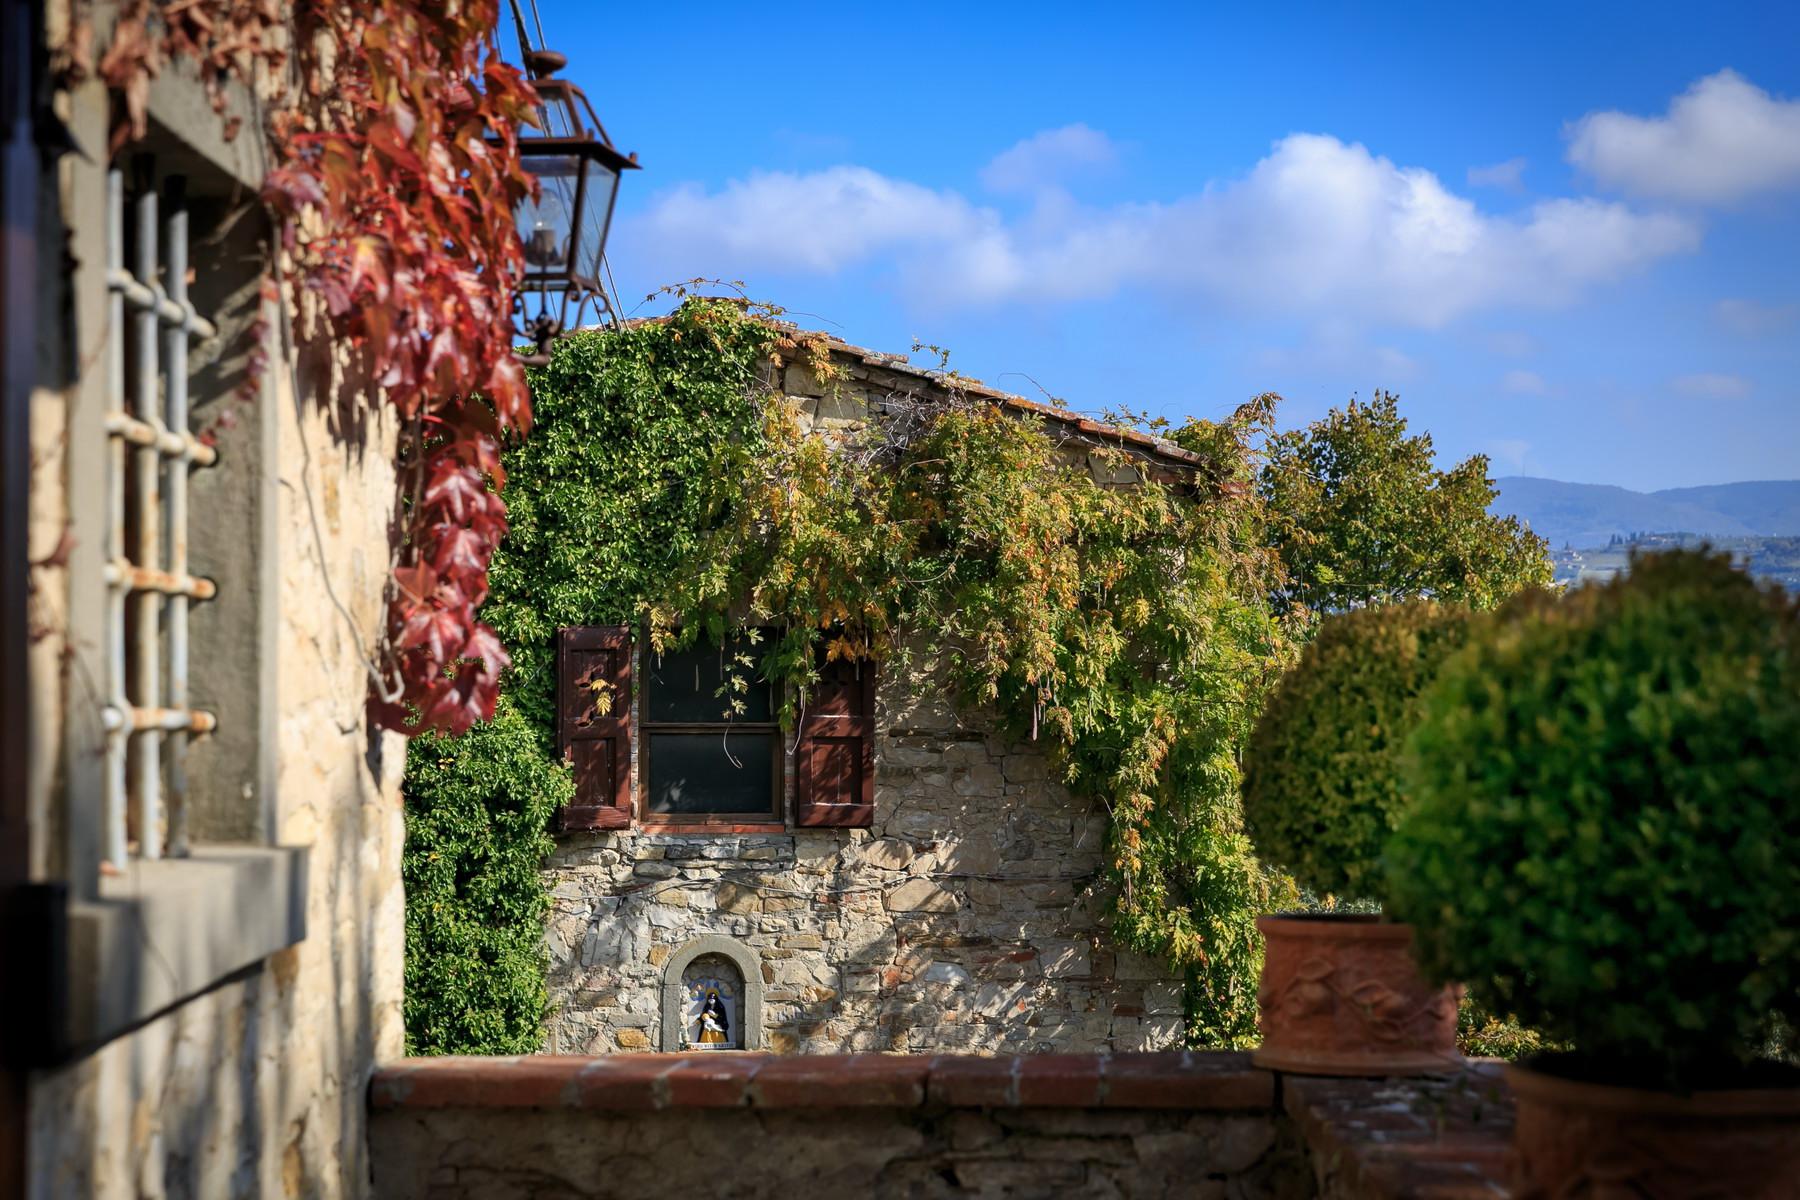 Rustico in Vendita a Castellina In Chianti: 5 locali, 720 mq - Foto 18